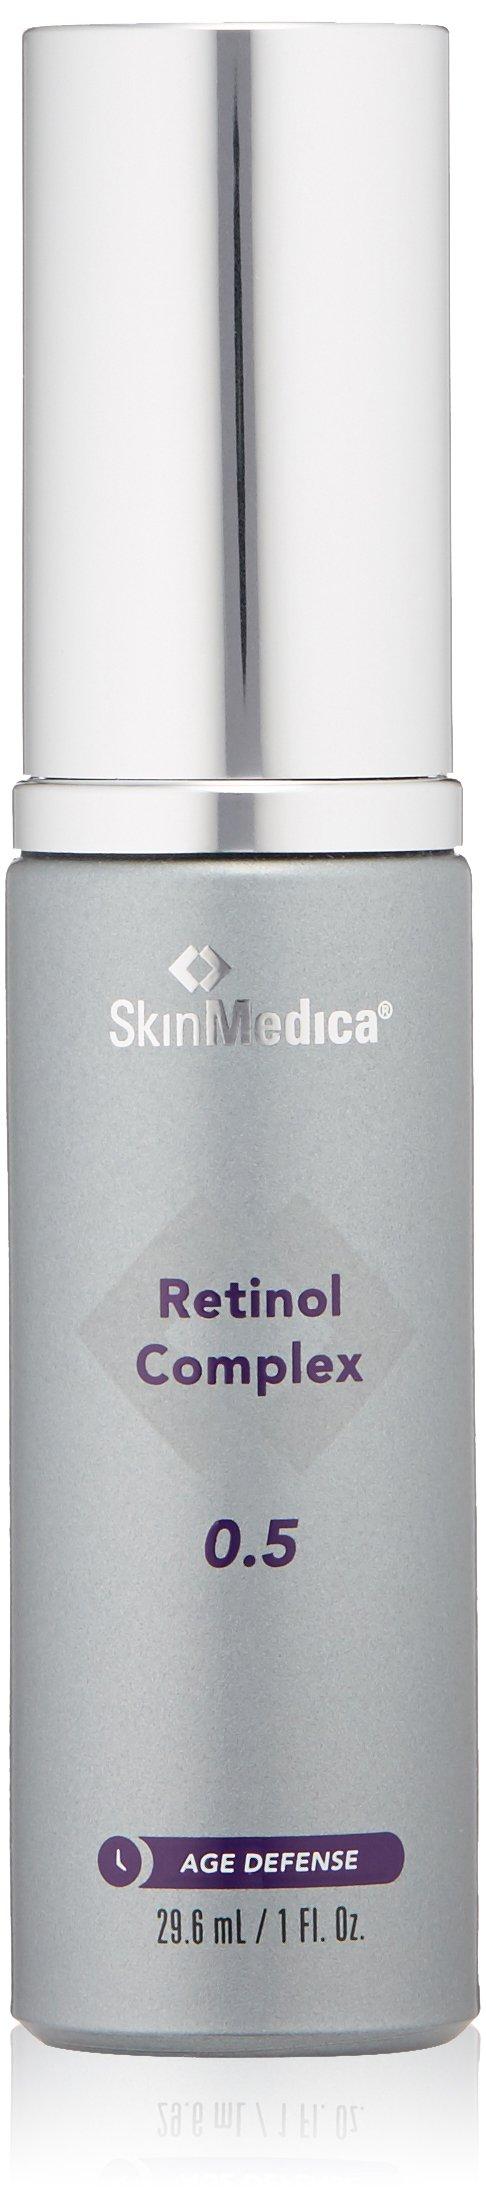 SkinMedica Retinol 0.5 Complex, 1 oz. by SkinMedica